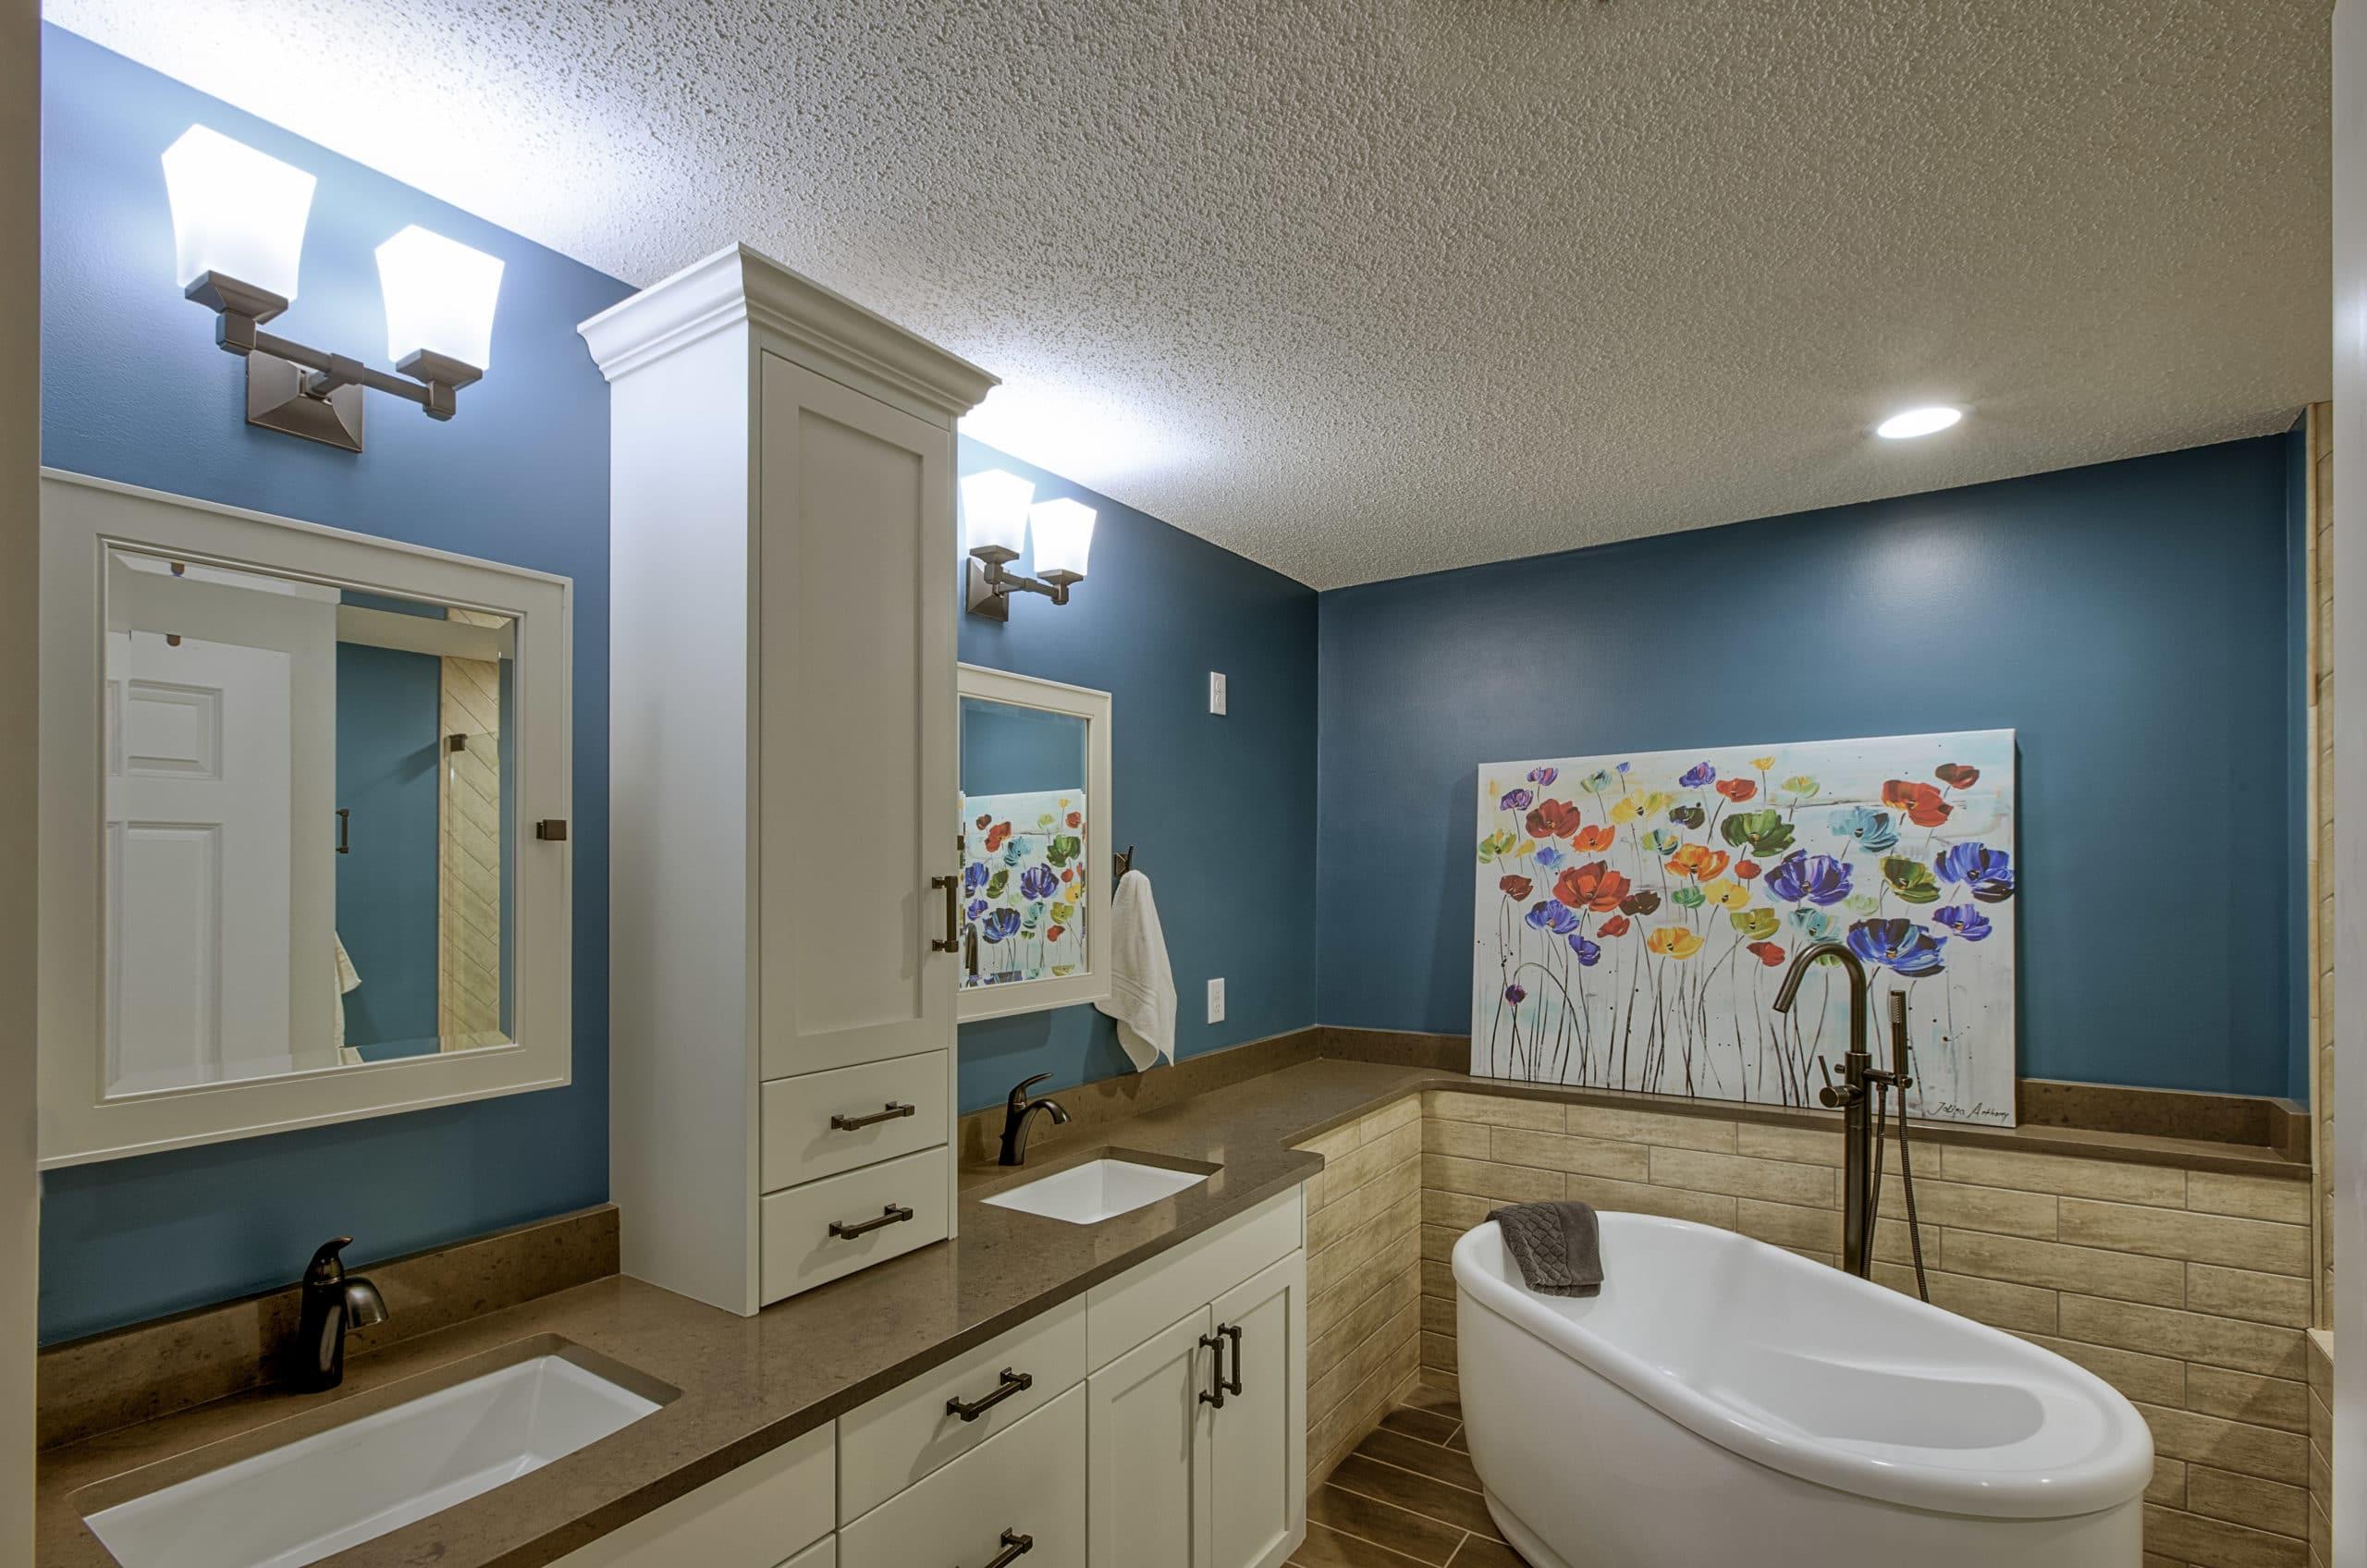 Condo Master Bathroom Remodel Eden Prairie MN BrynnAlden Interiors - Bathroom remodel eden prairie mn